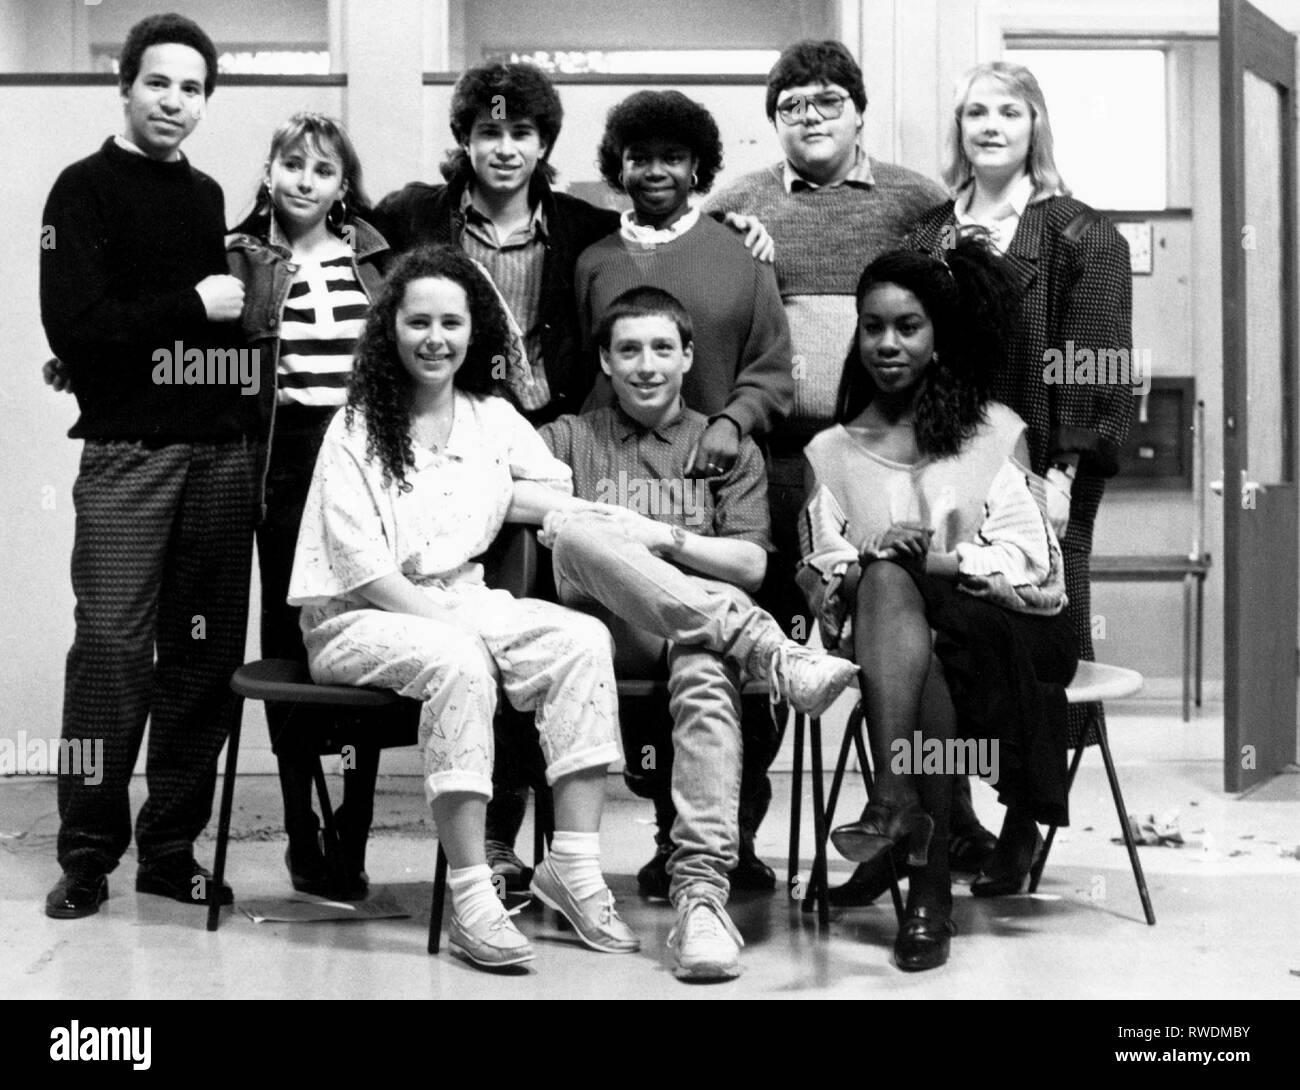 CHRYSTIE,WILKS,SIMMONDS,MCLAUGHLIN,MUSTAFA,BETTLES,MCDONALD, GRANGE HILL, 1986 Stock Photo